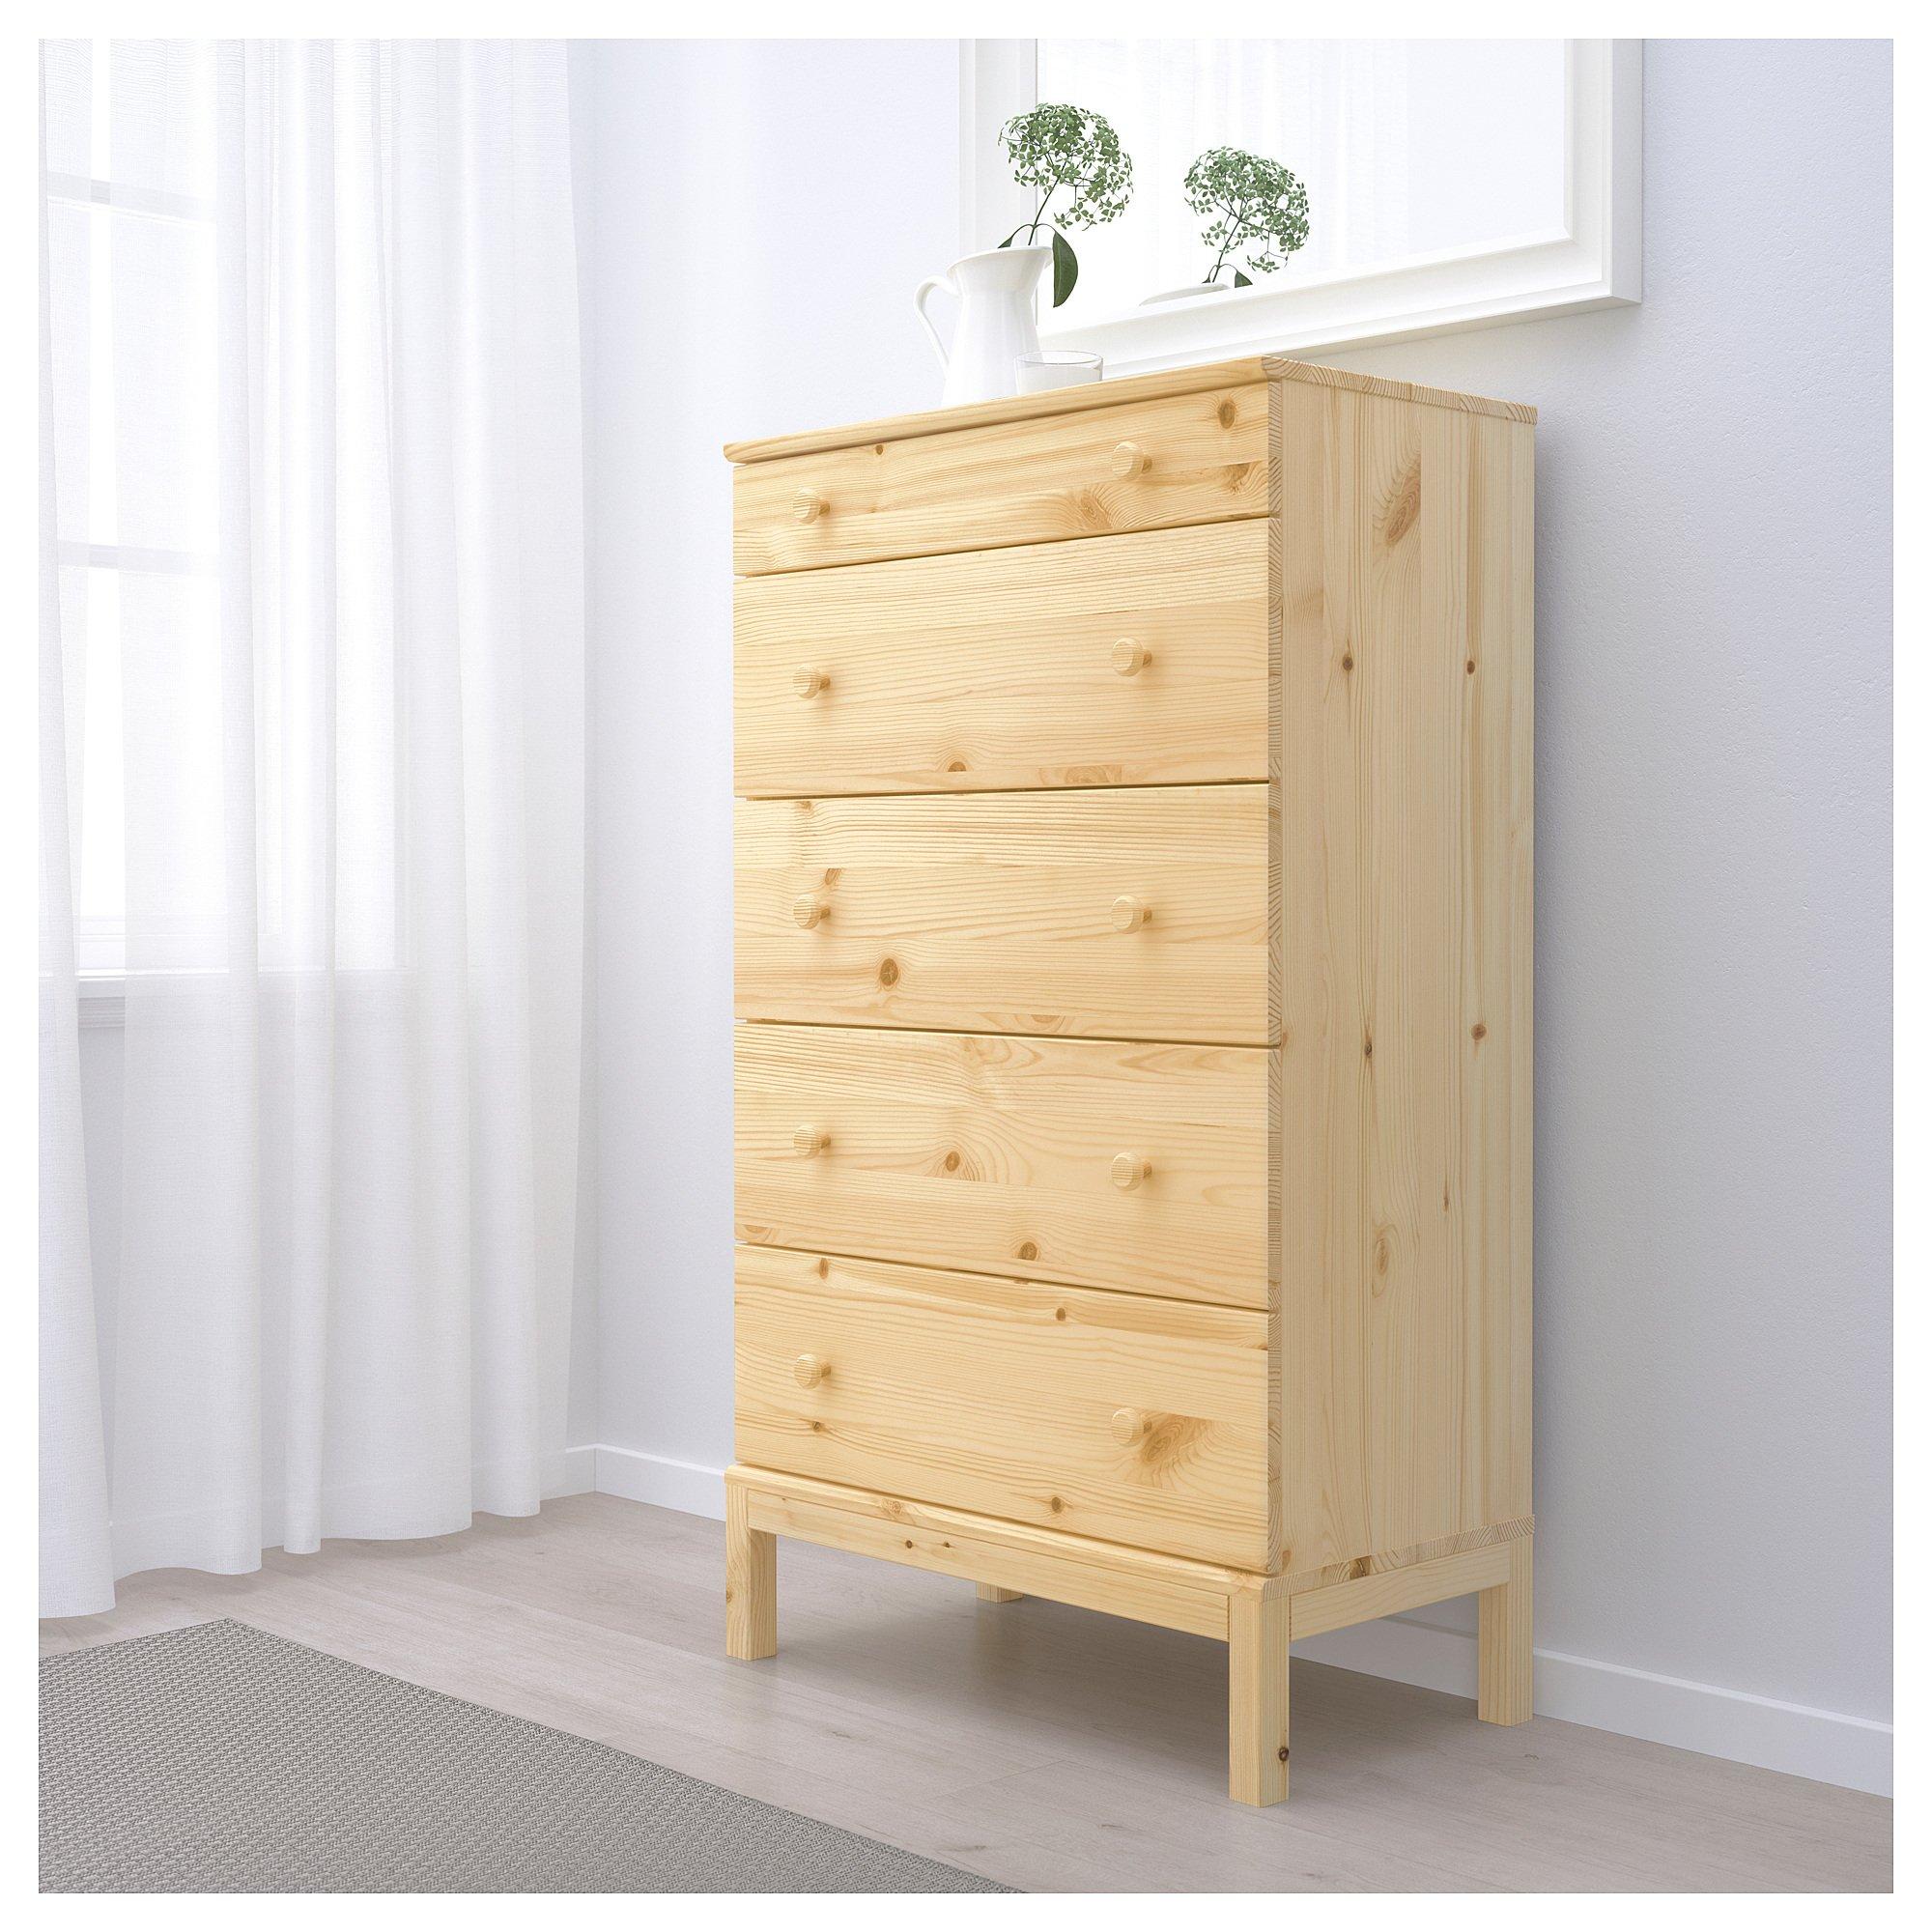 Ikea 5-drawer chest, pine